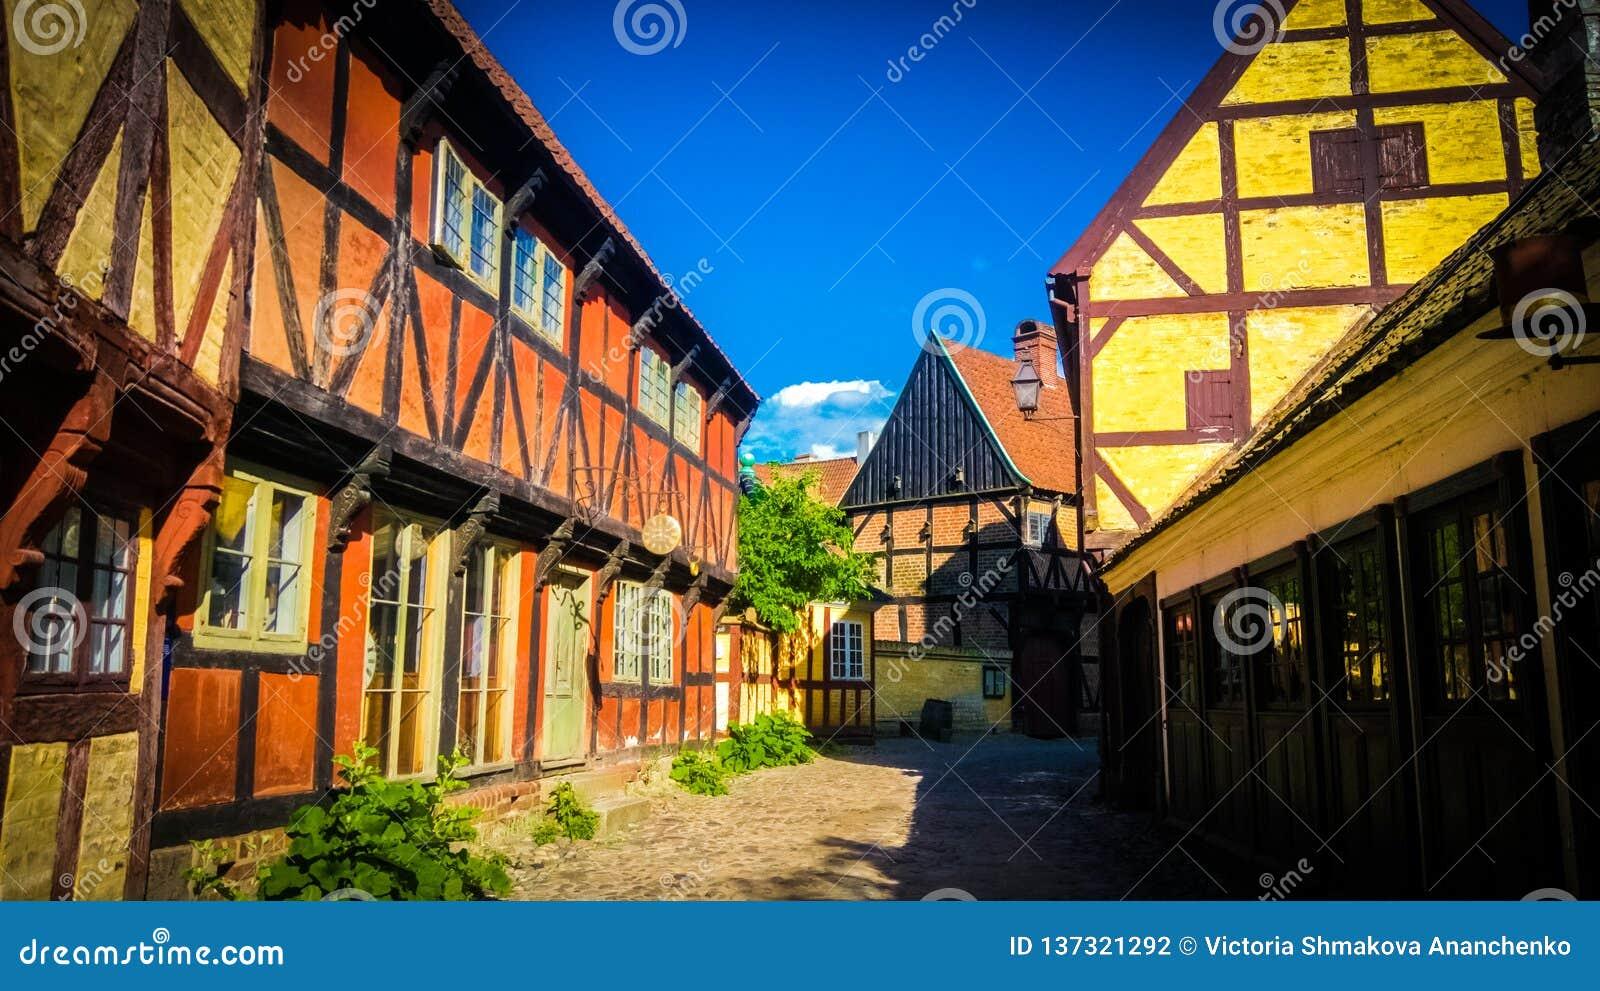 Casas dinamarquesas tradicionais em Den Gamle By em Aarhus, Dinamarca